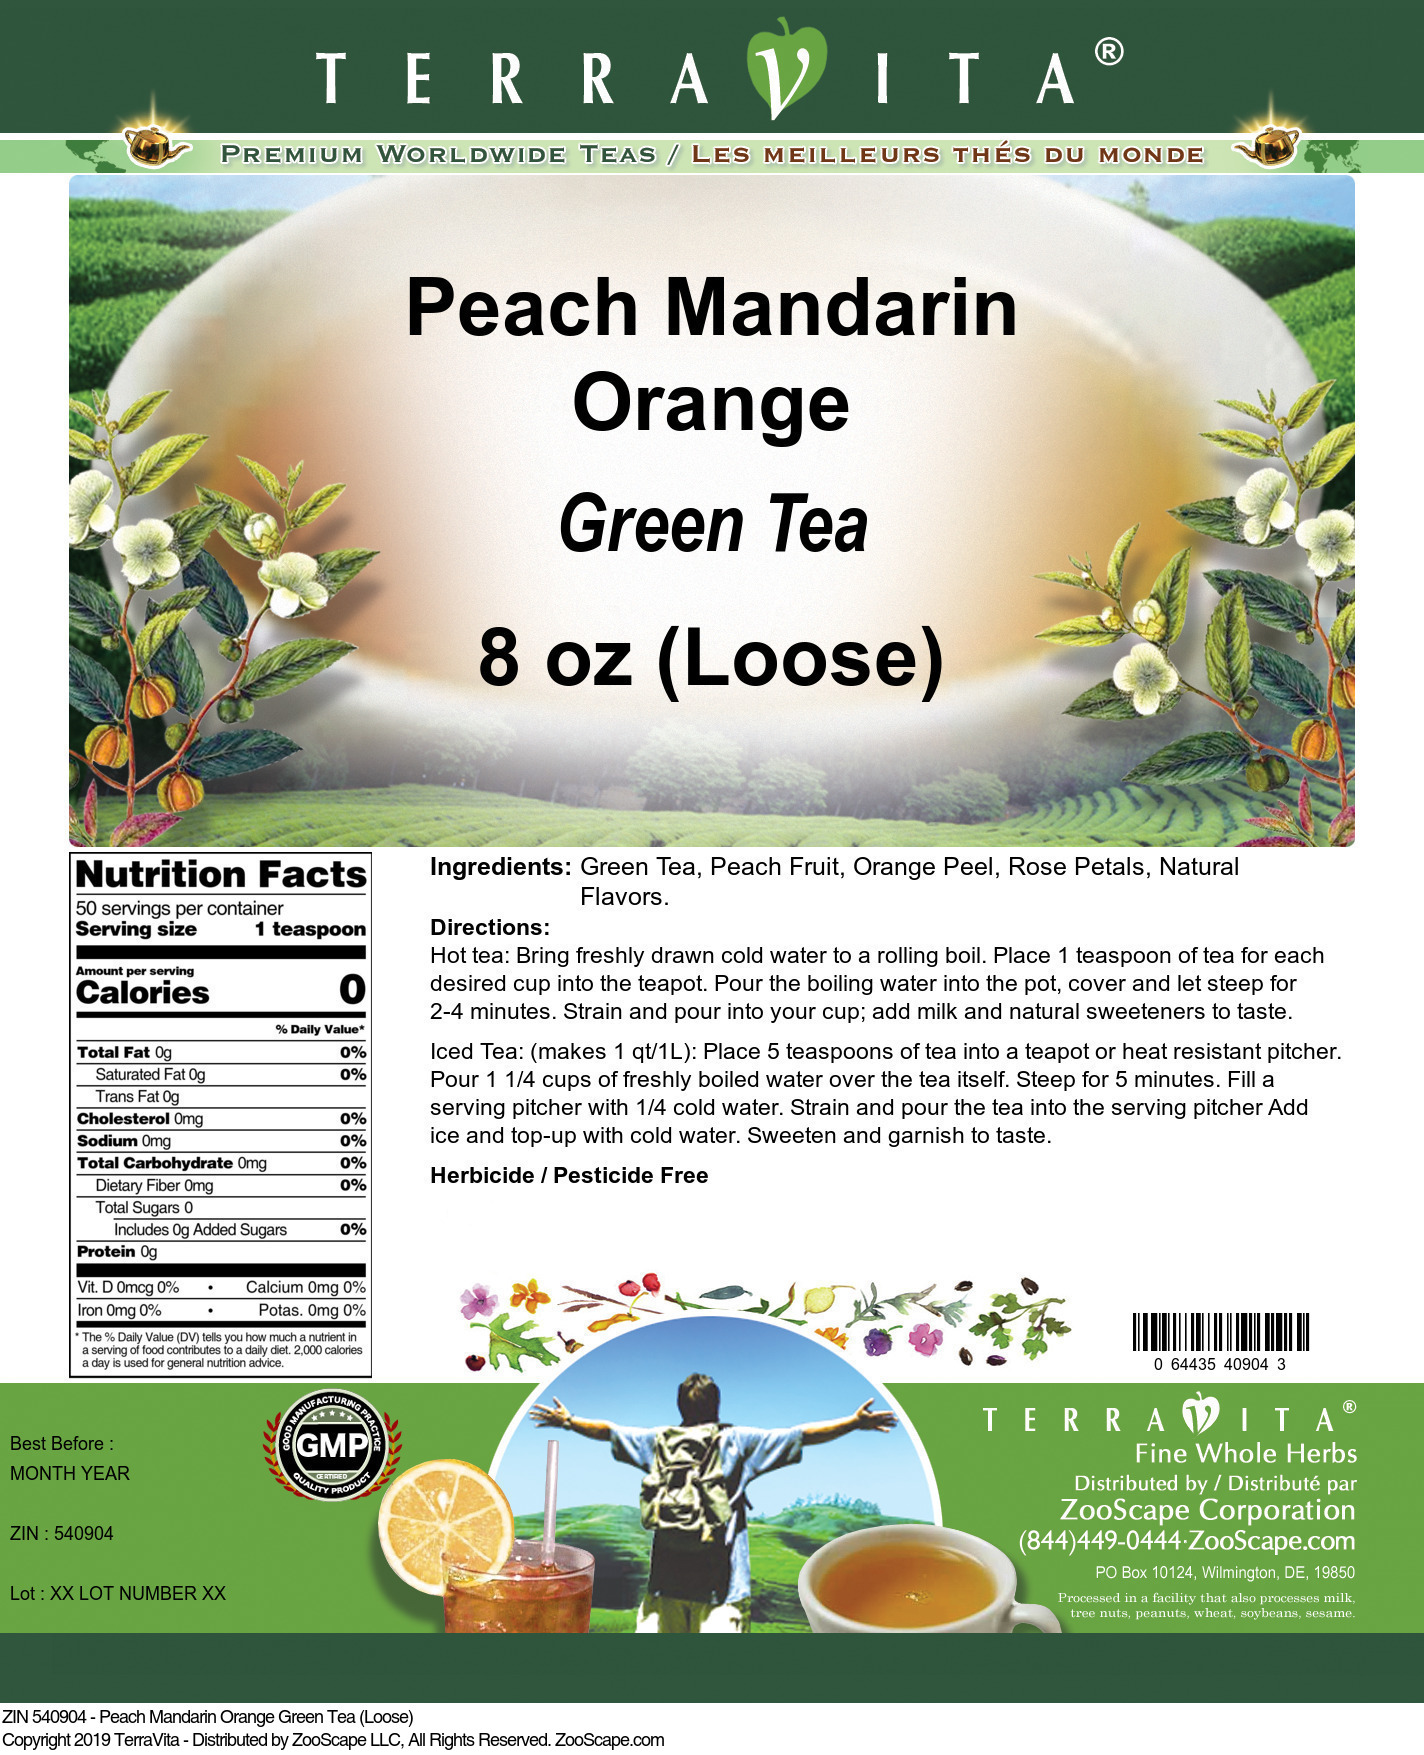 Peach Mandarin Orange Green Tea (Loose)